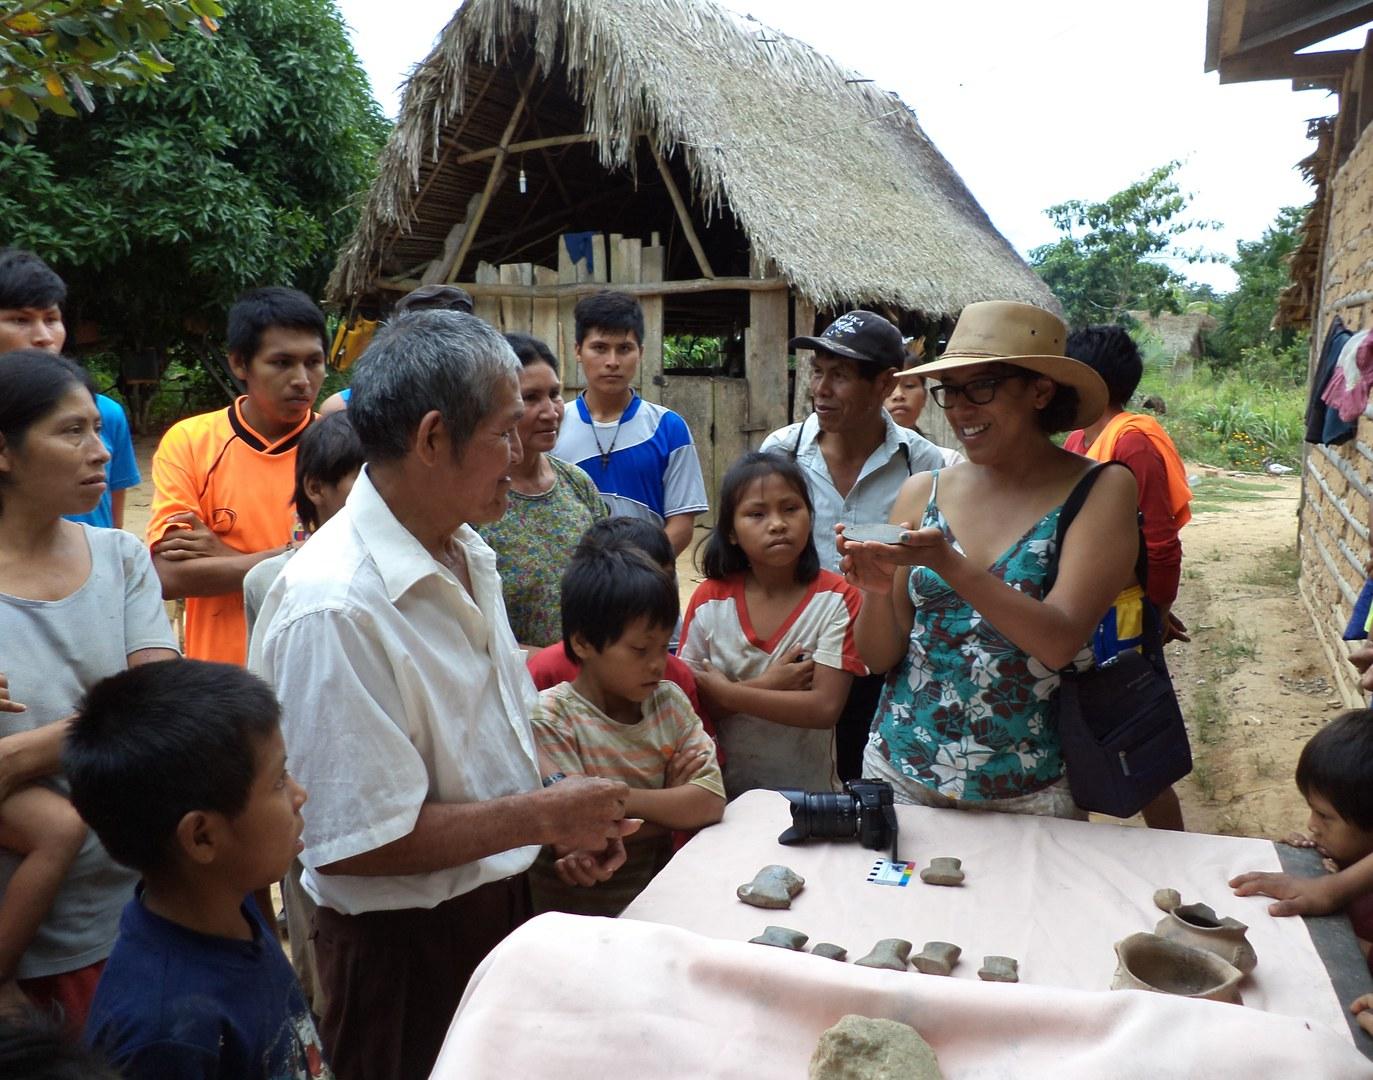 Die Gemeinde Tsimane